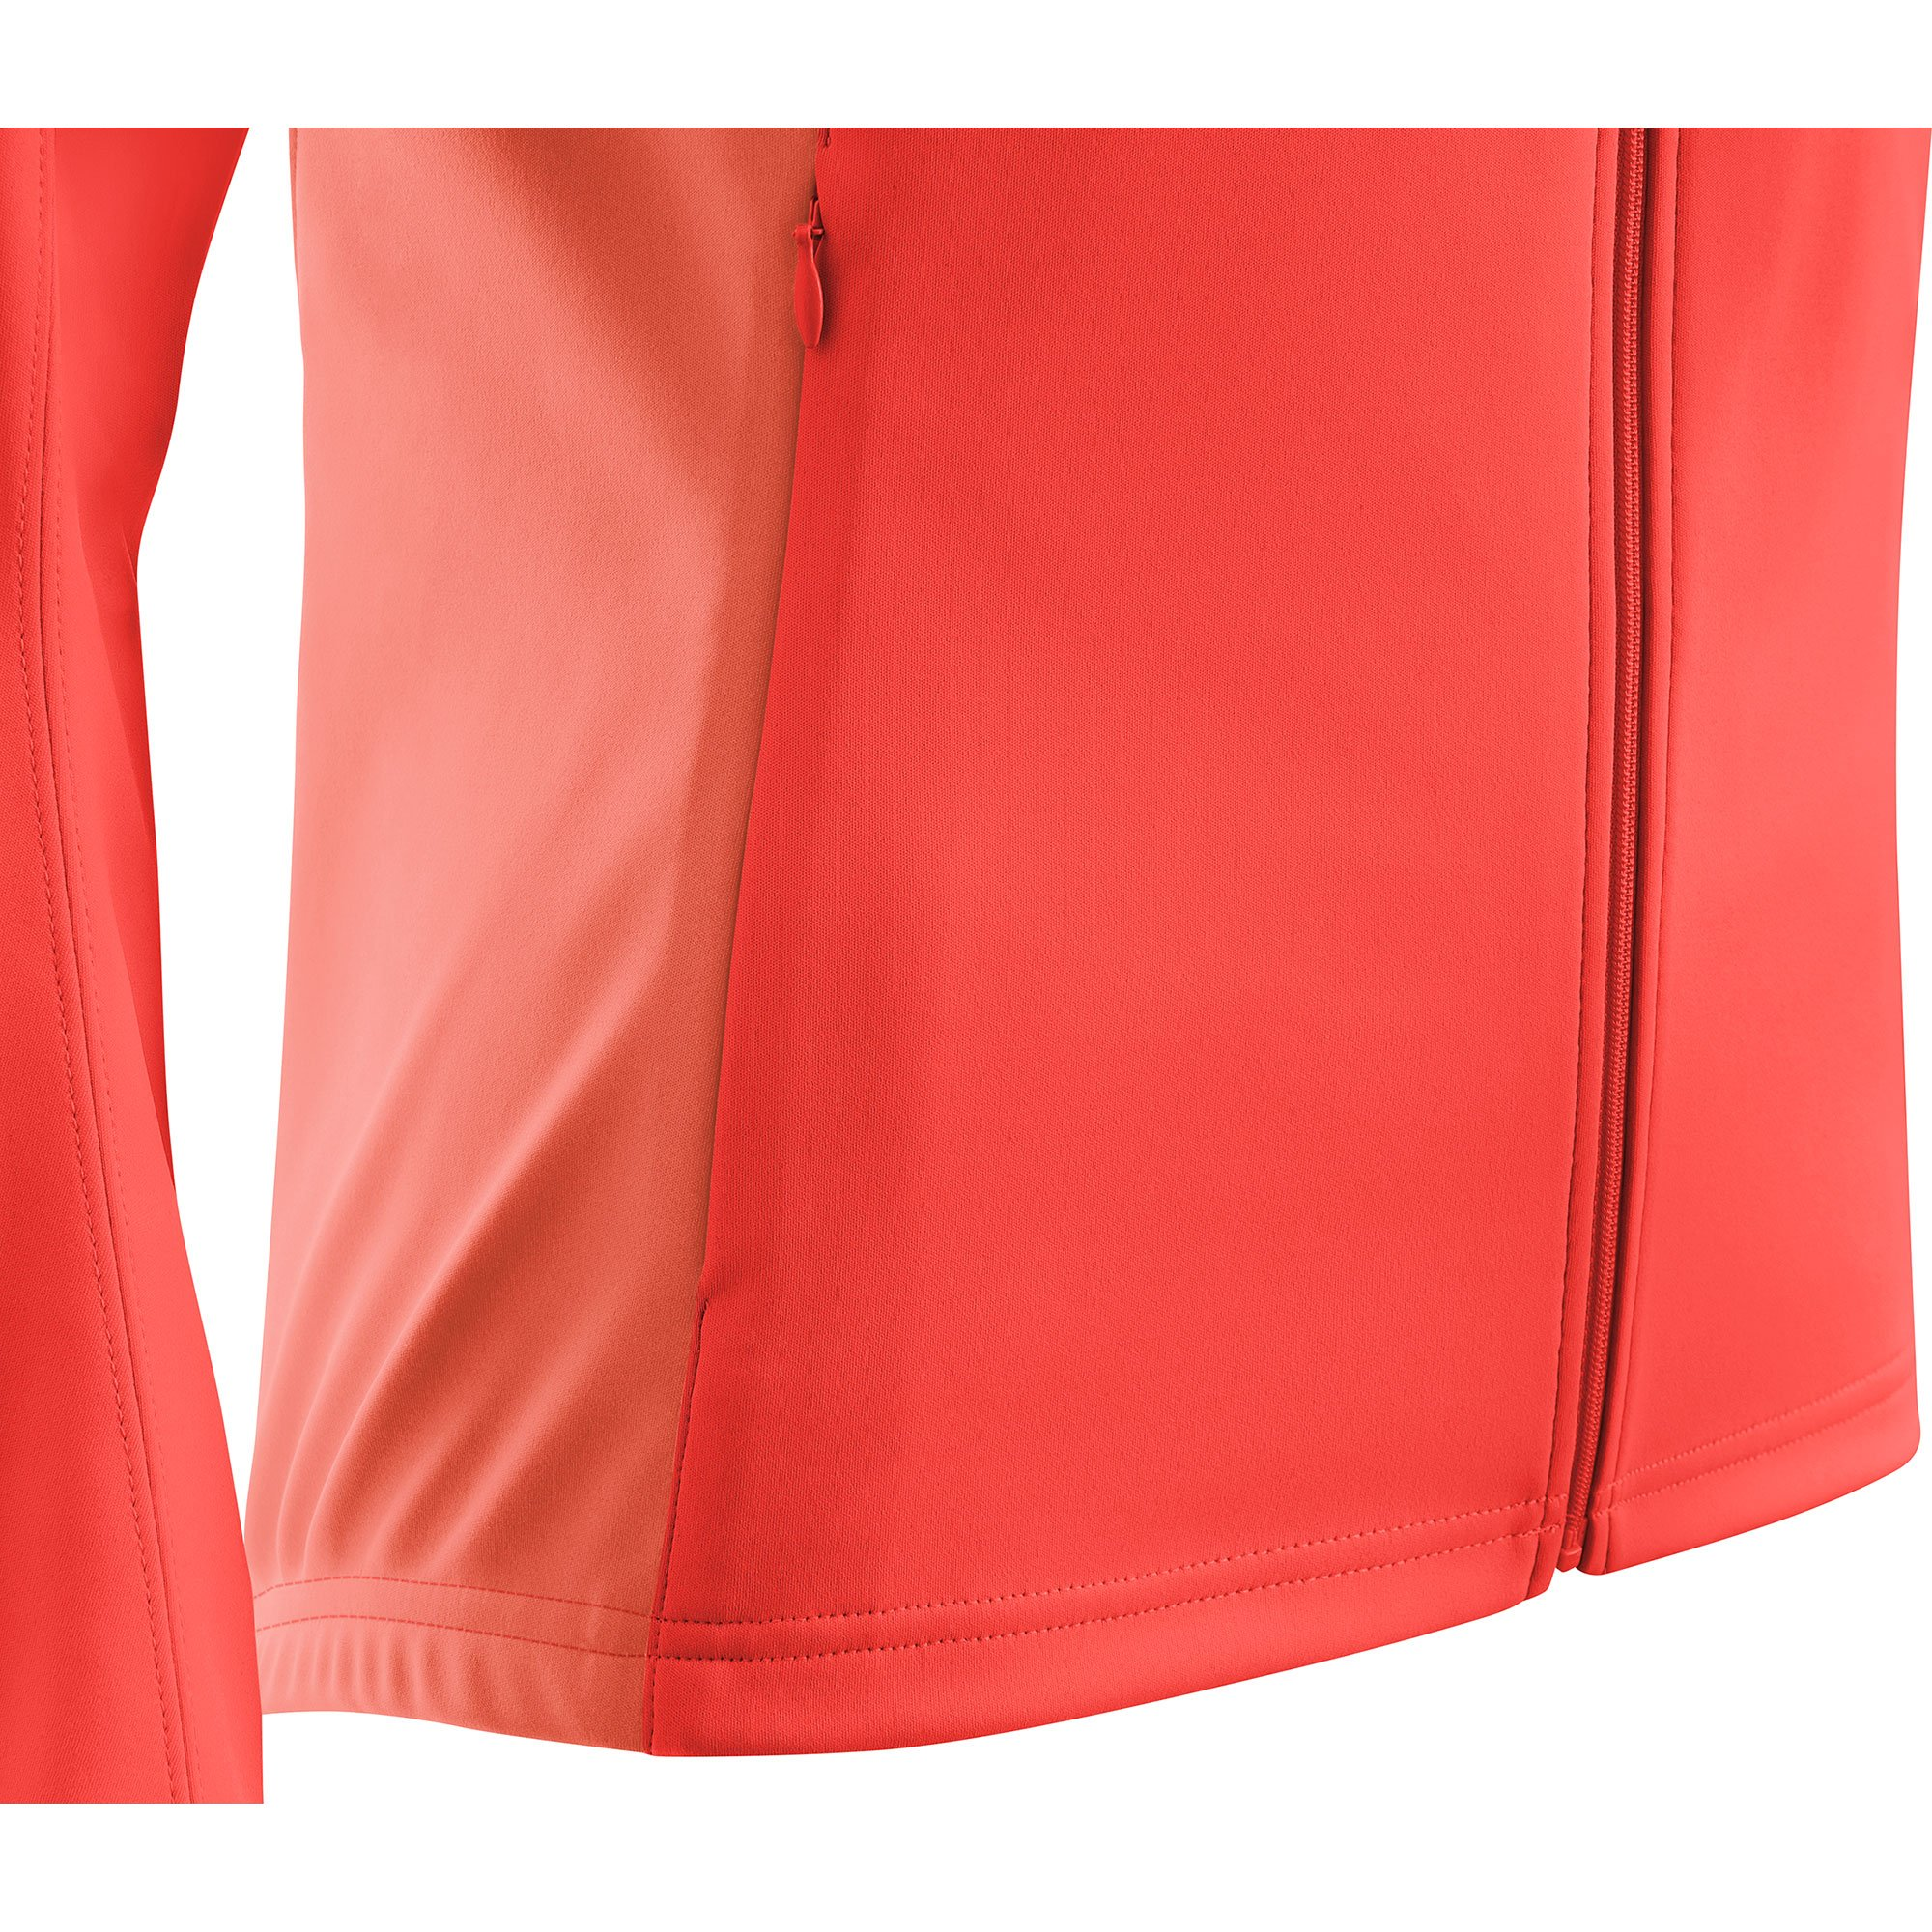 GORE Wear Women's Windproof Cycling Jacket, Removable Sleeves, GORE Wear C3 Women's GORE Wear WINDSTOPPER Phantom Zip-Off Jacket, Size: L, Color: Lumi Orange/Coral Glow, 100191 by GORE WEAR (Image #7)